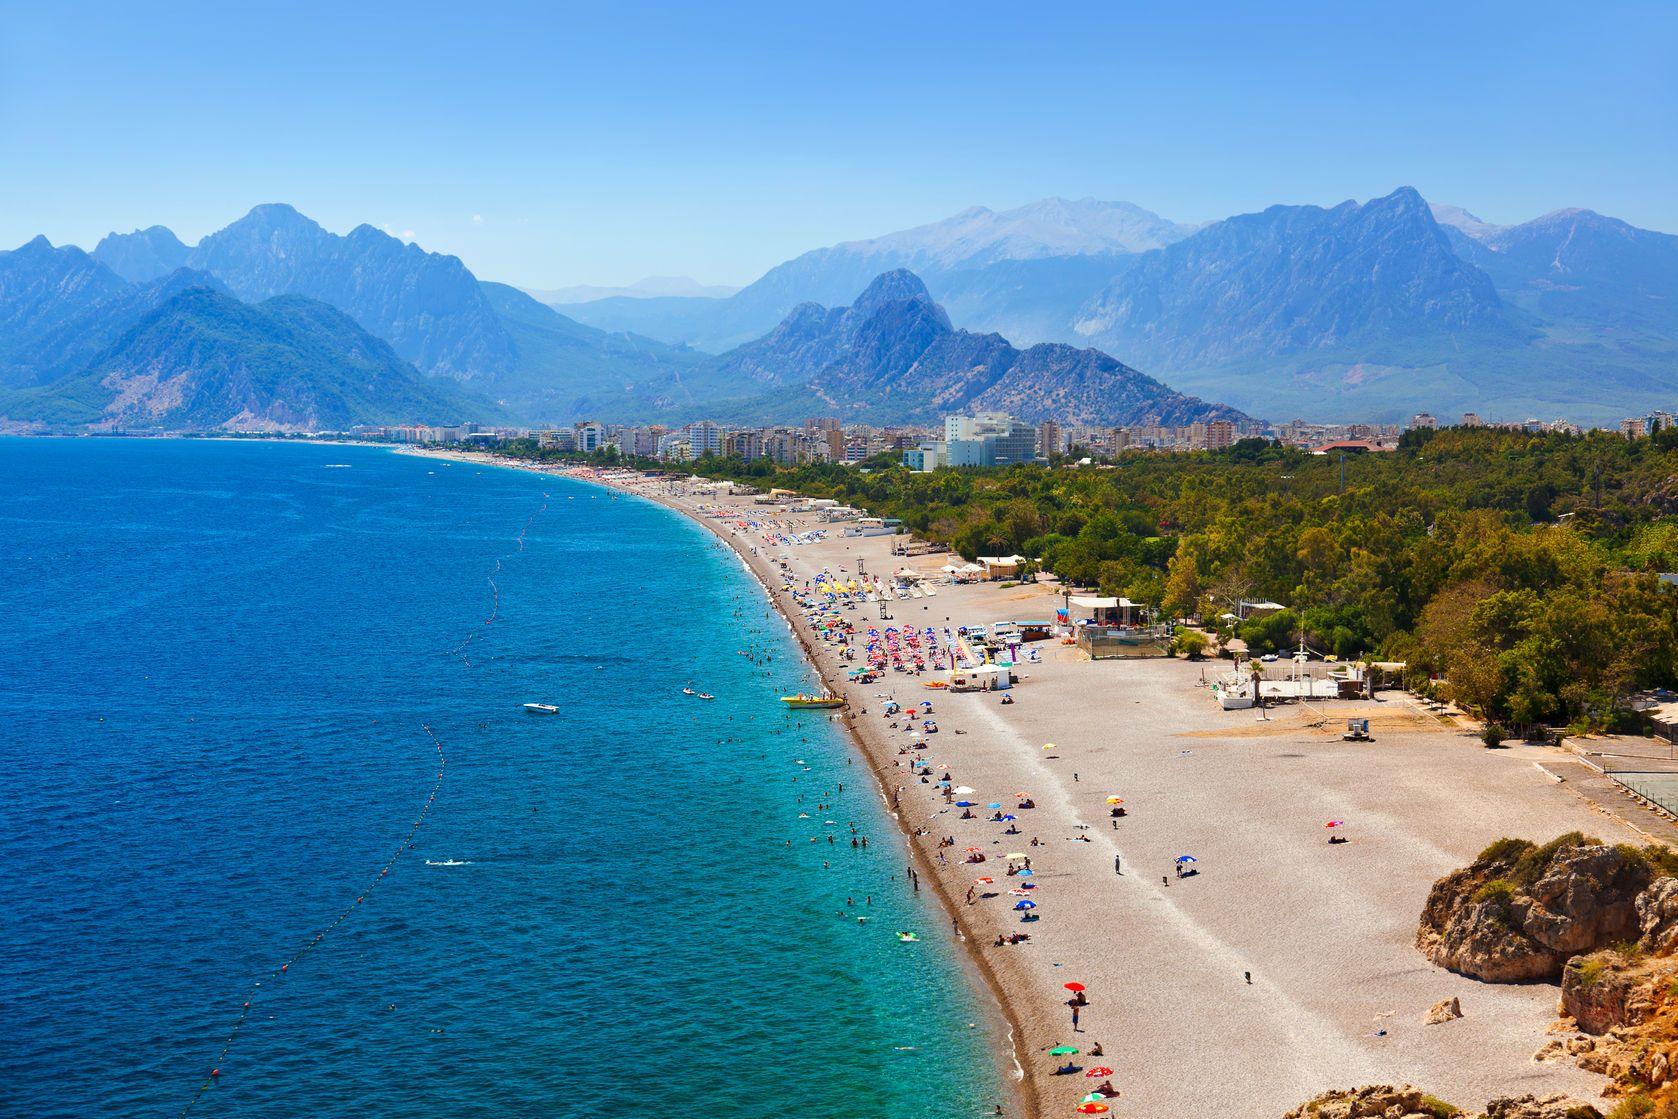 Pláž v tureckém letovisku Antalya   Violin/123RF.com